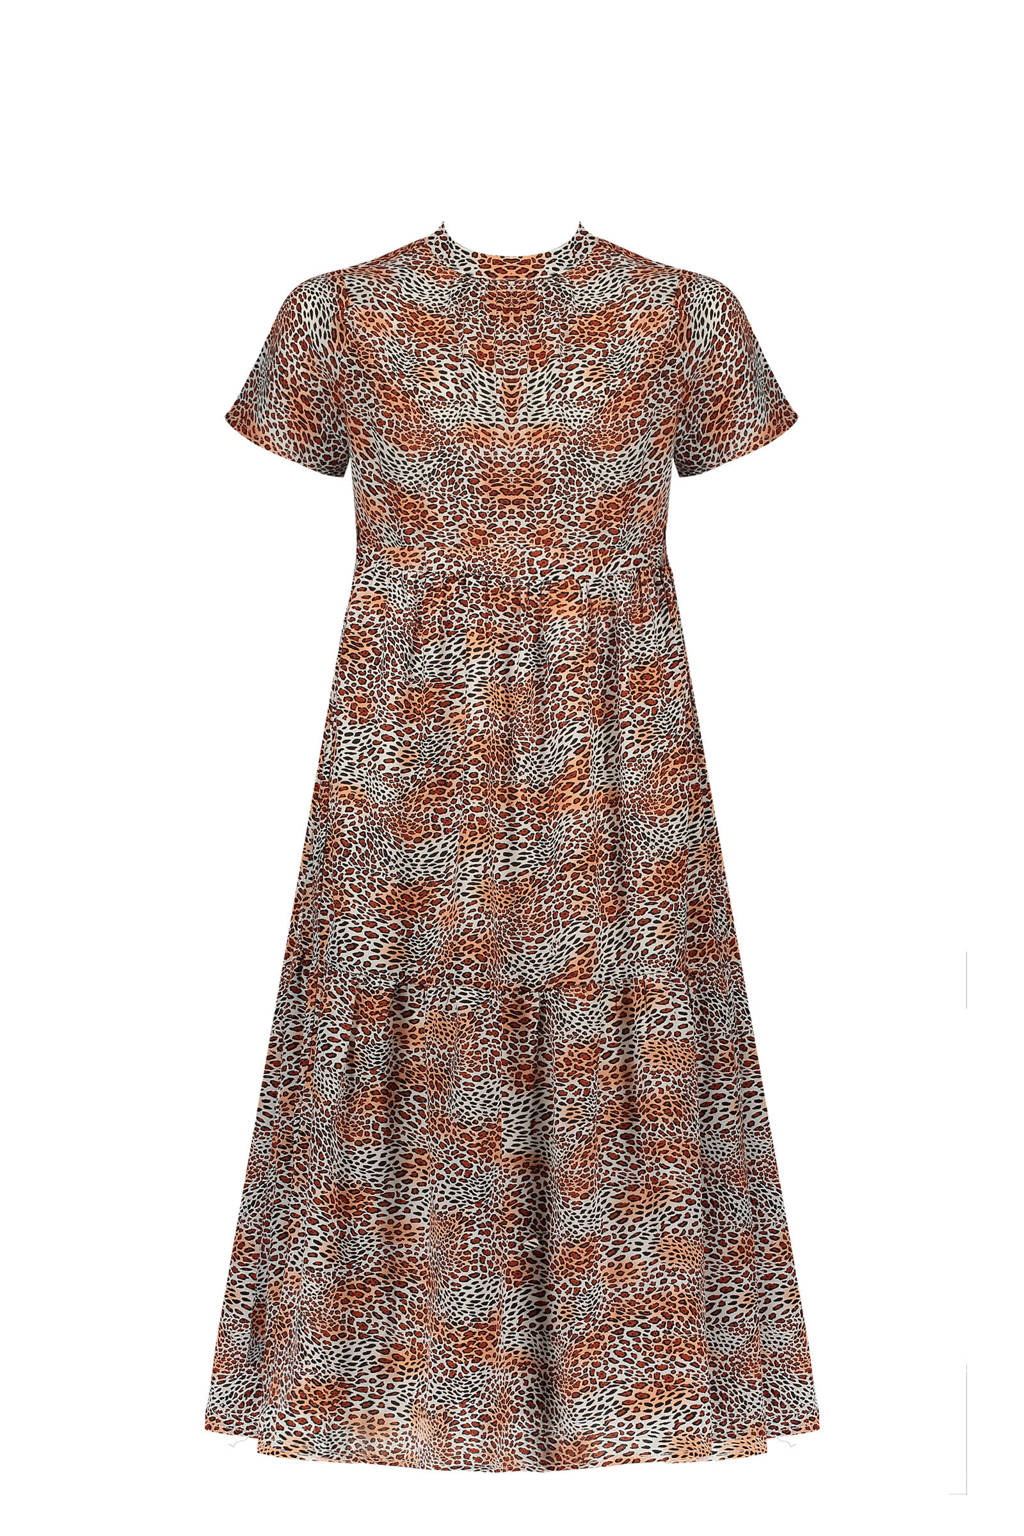 NoBell' maxi jurk Mian met dierenprint en plooien beige/roestbruin/oranje, Beige/roestbruin/oranje